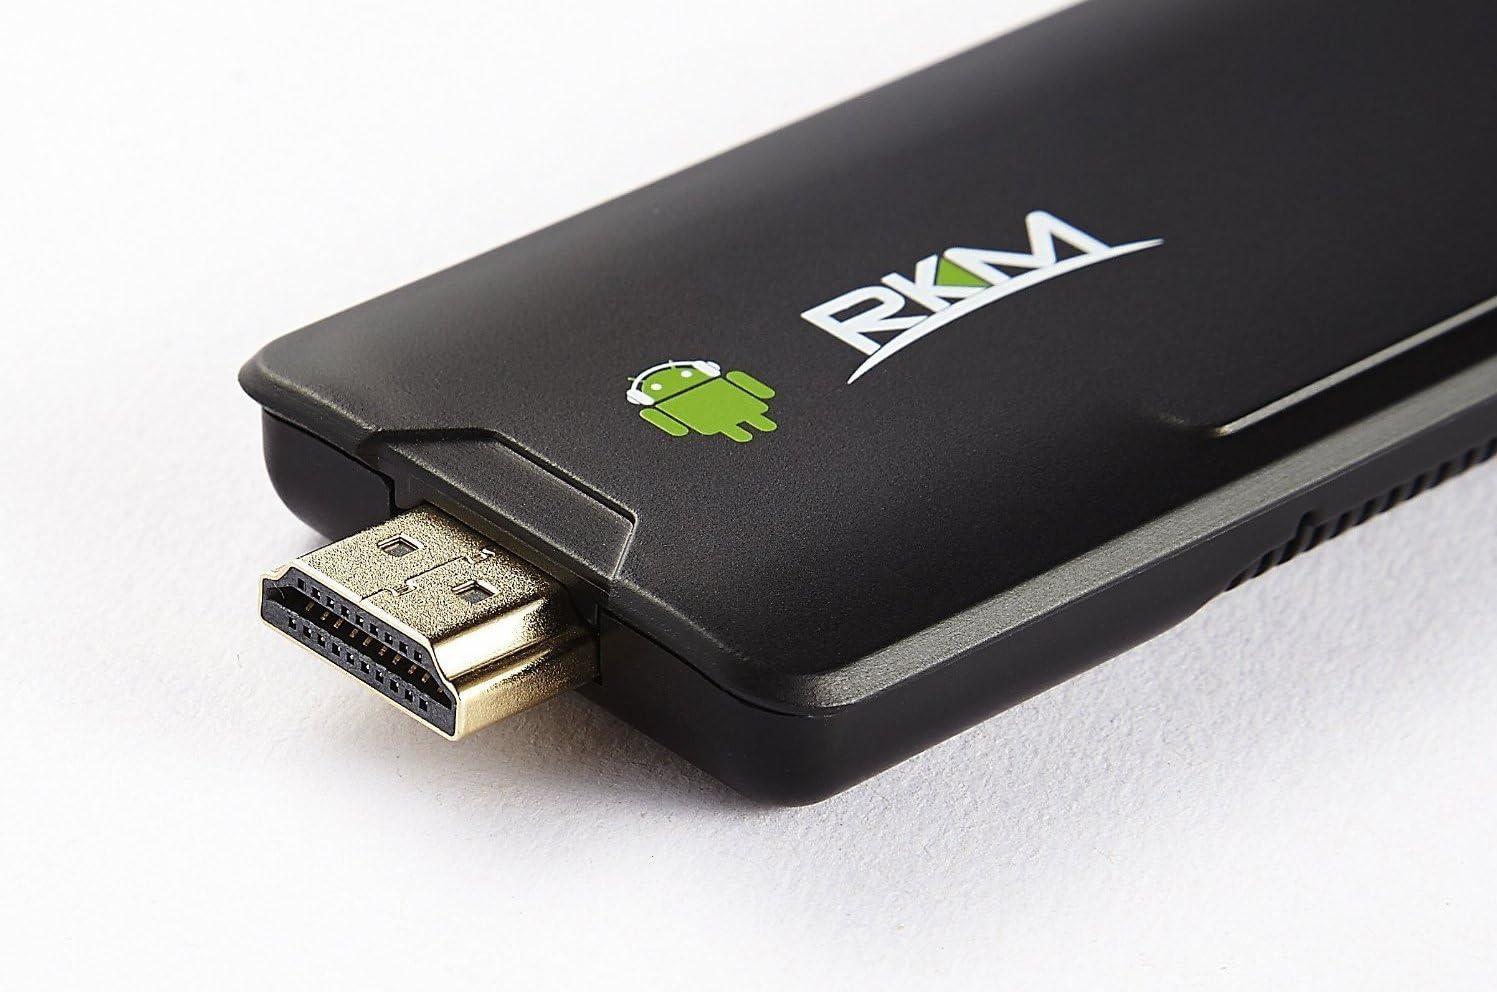 RKM Rikomagic Quad Core Mini PC MK802 IV RK3188 Bluetooth Android 4.2 - 16Gb: Amazon.es: Informática